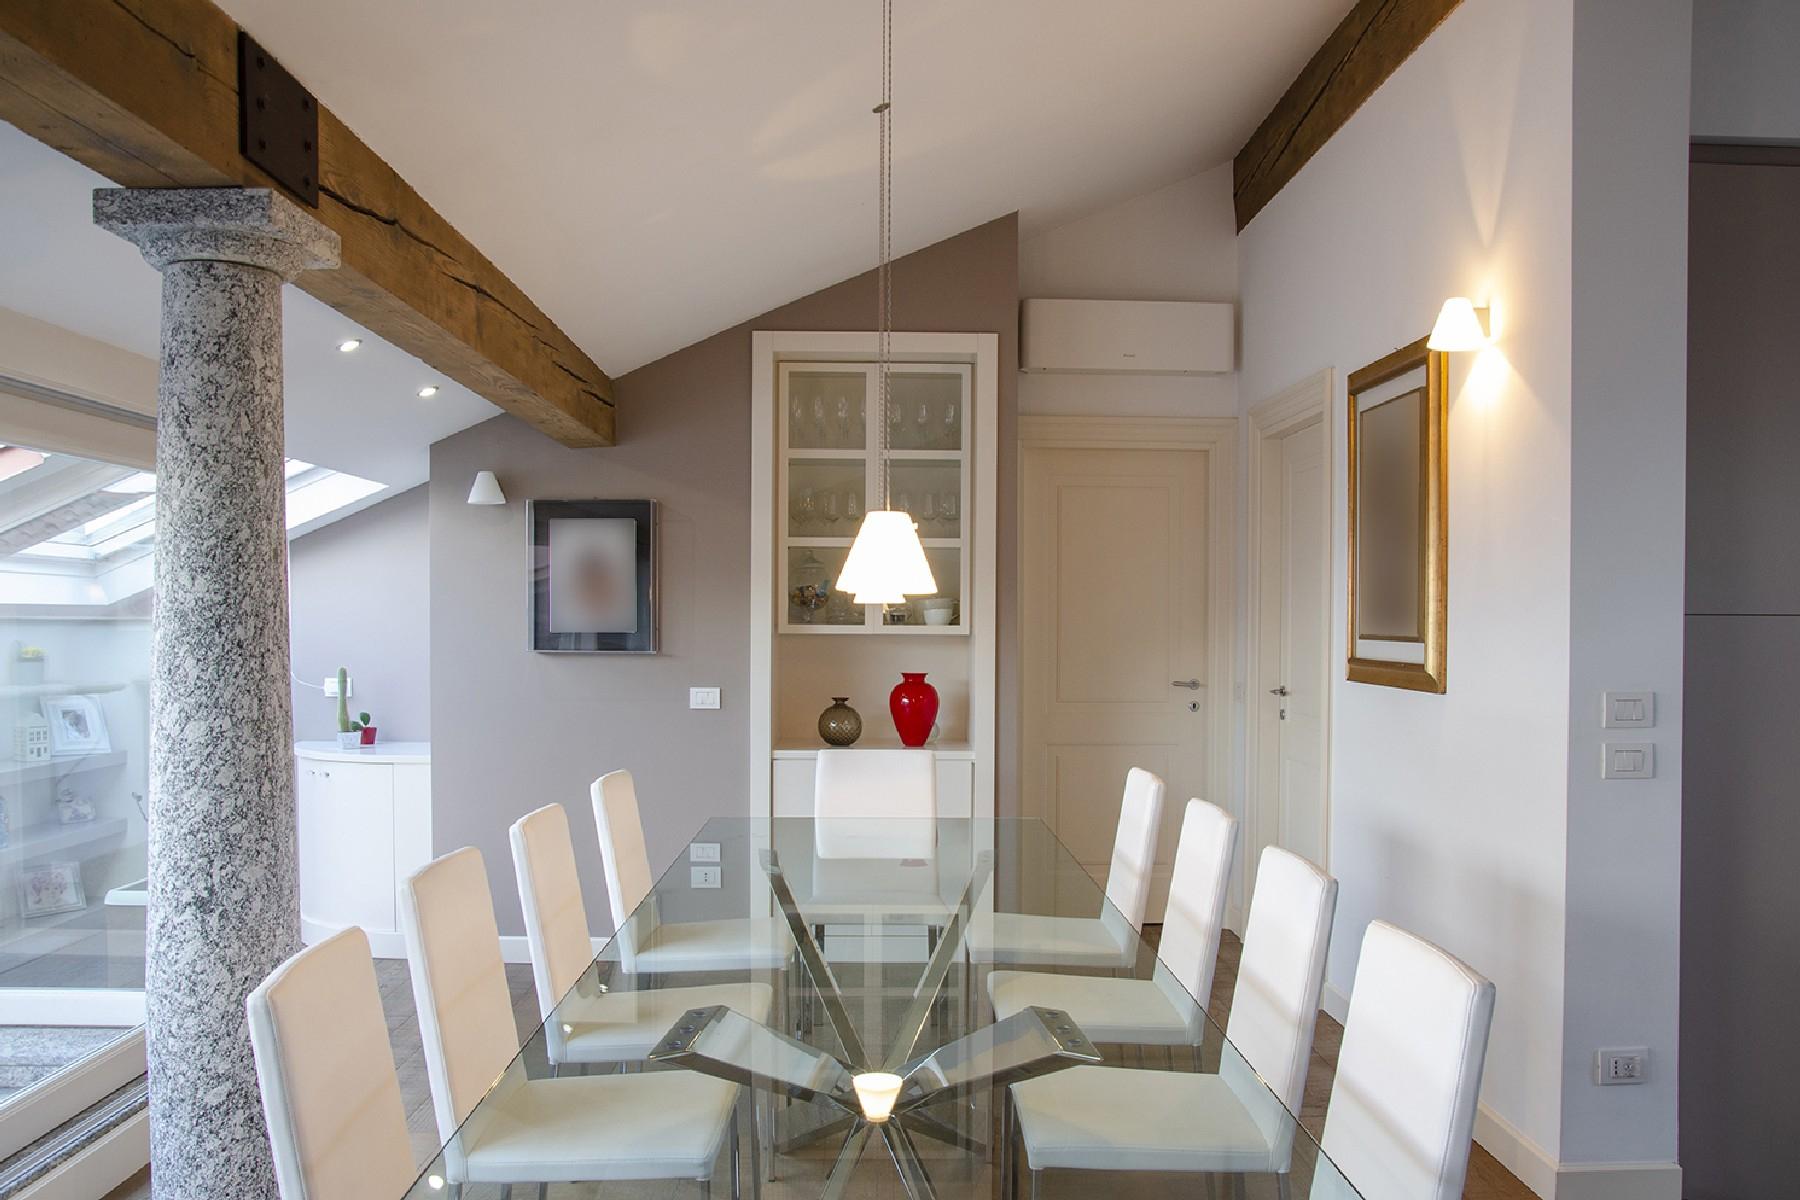 Appartamento in Vendita a Merate: 4 locali, 225 mq - Foto 2